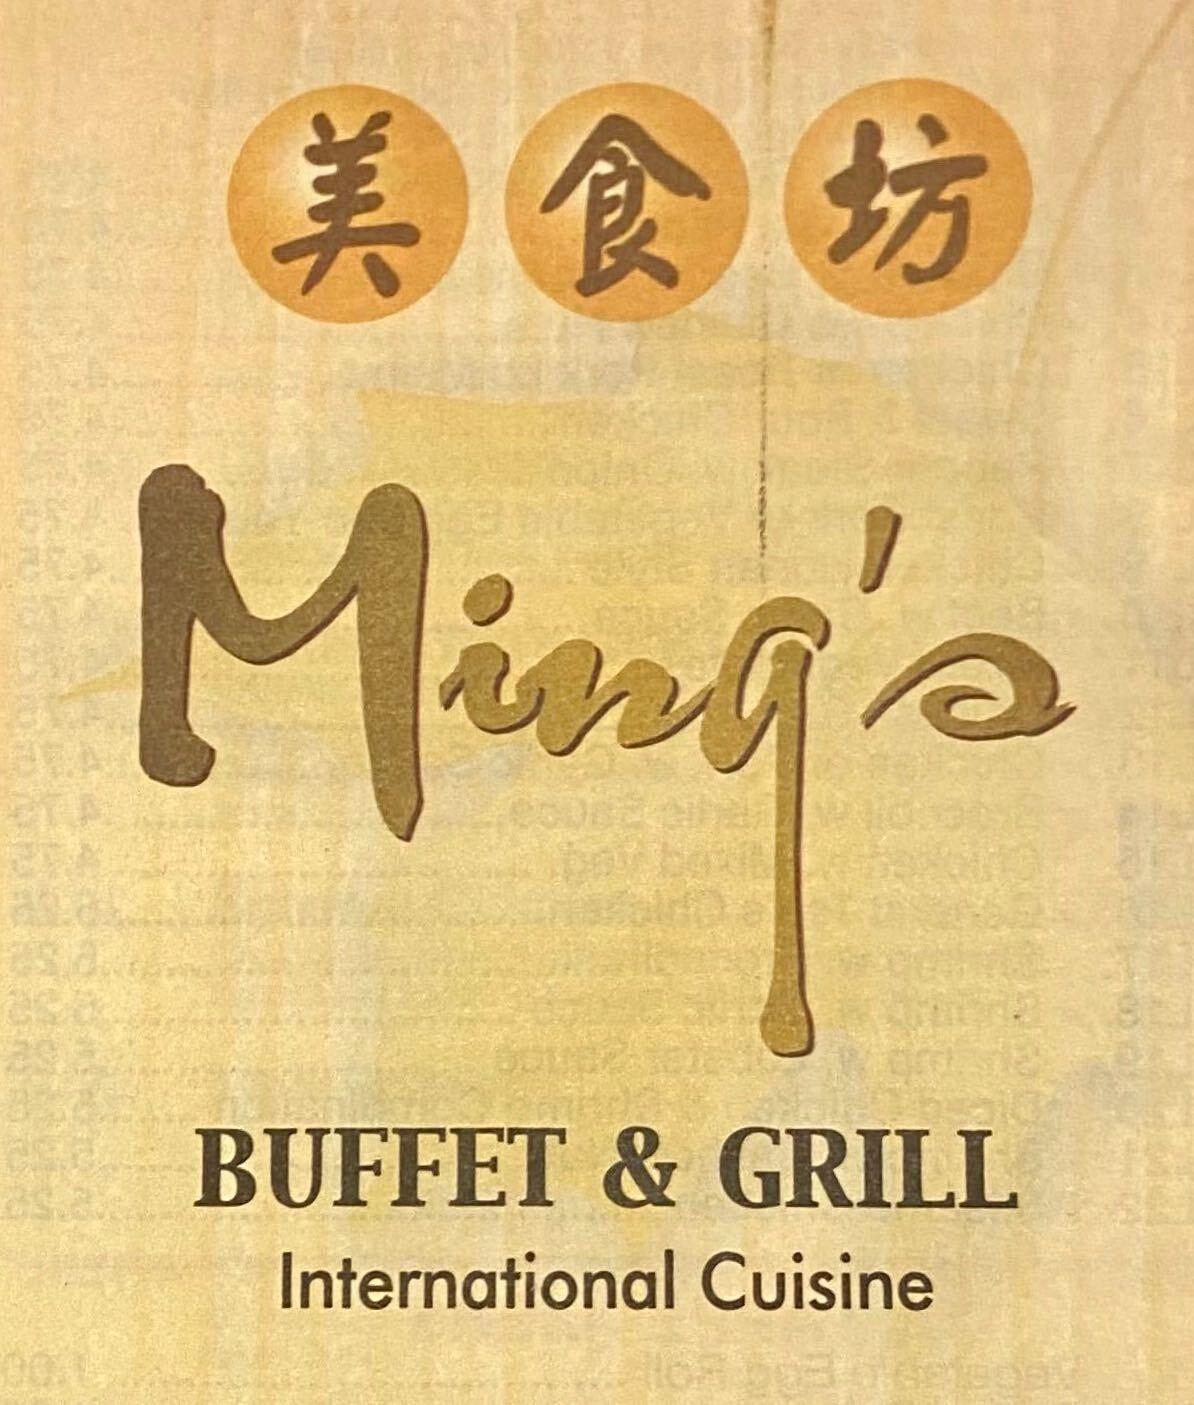 Ming's Chinese